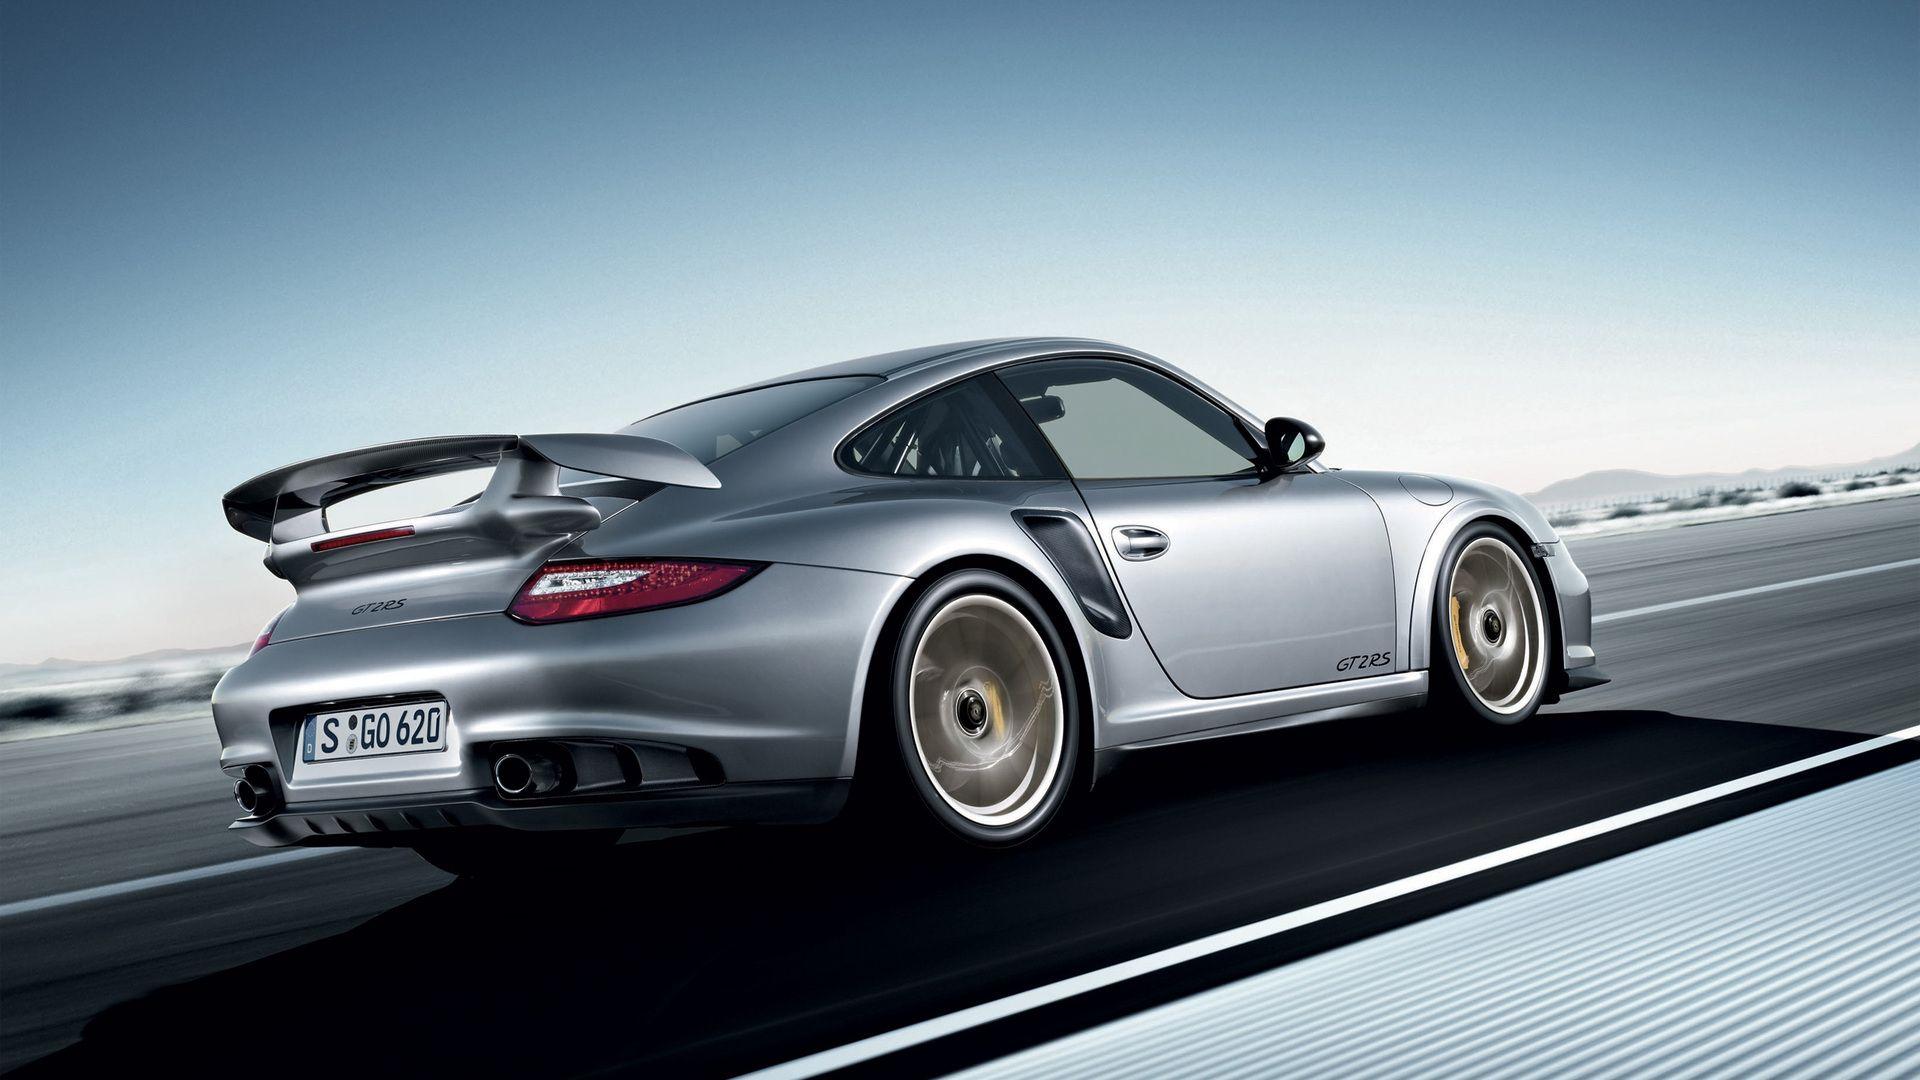 fddf9cd95dfacd63253691d5fdb8ad32 Astounding Porsche 911 Gt2 Car and Driver Cars Trend